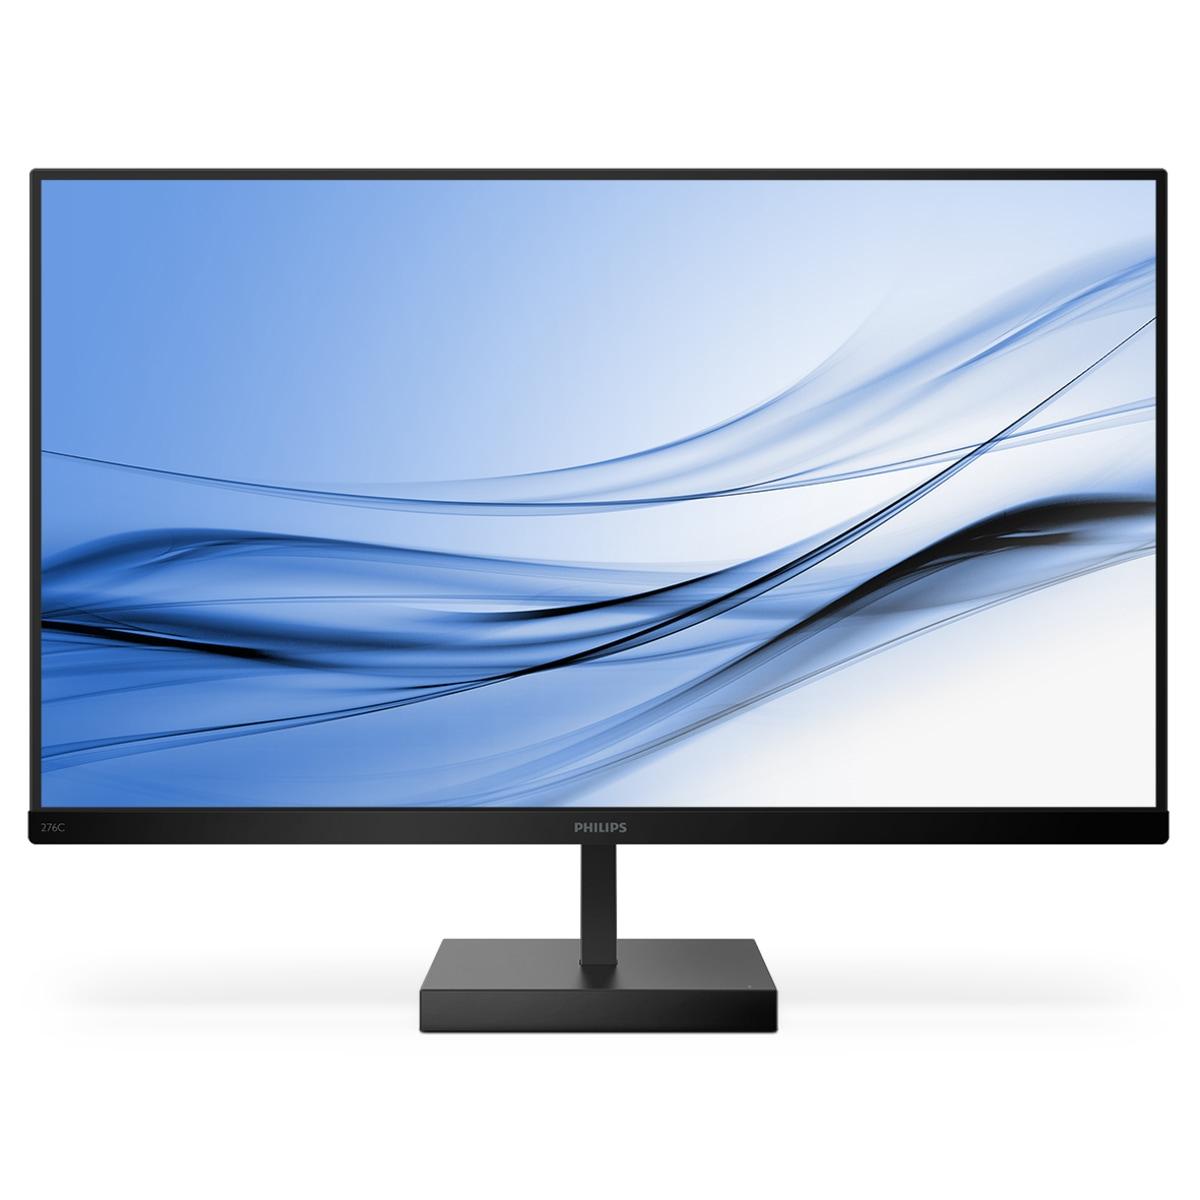 Philips C Line 276C8/00 computer monitor 68.6 cm 27